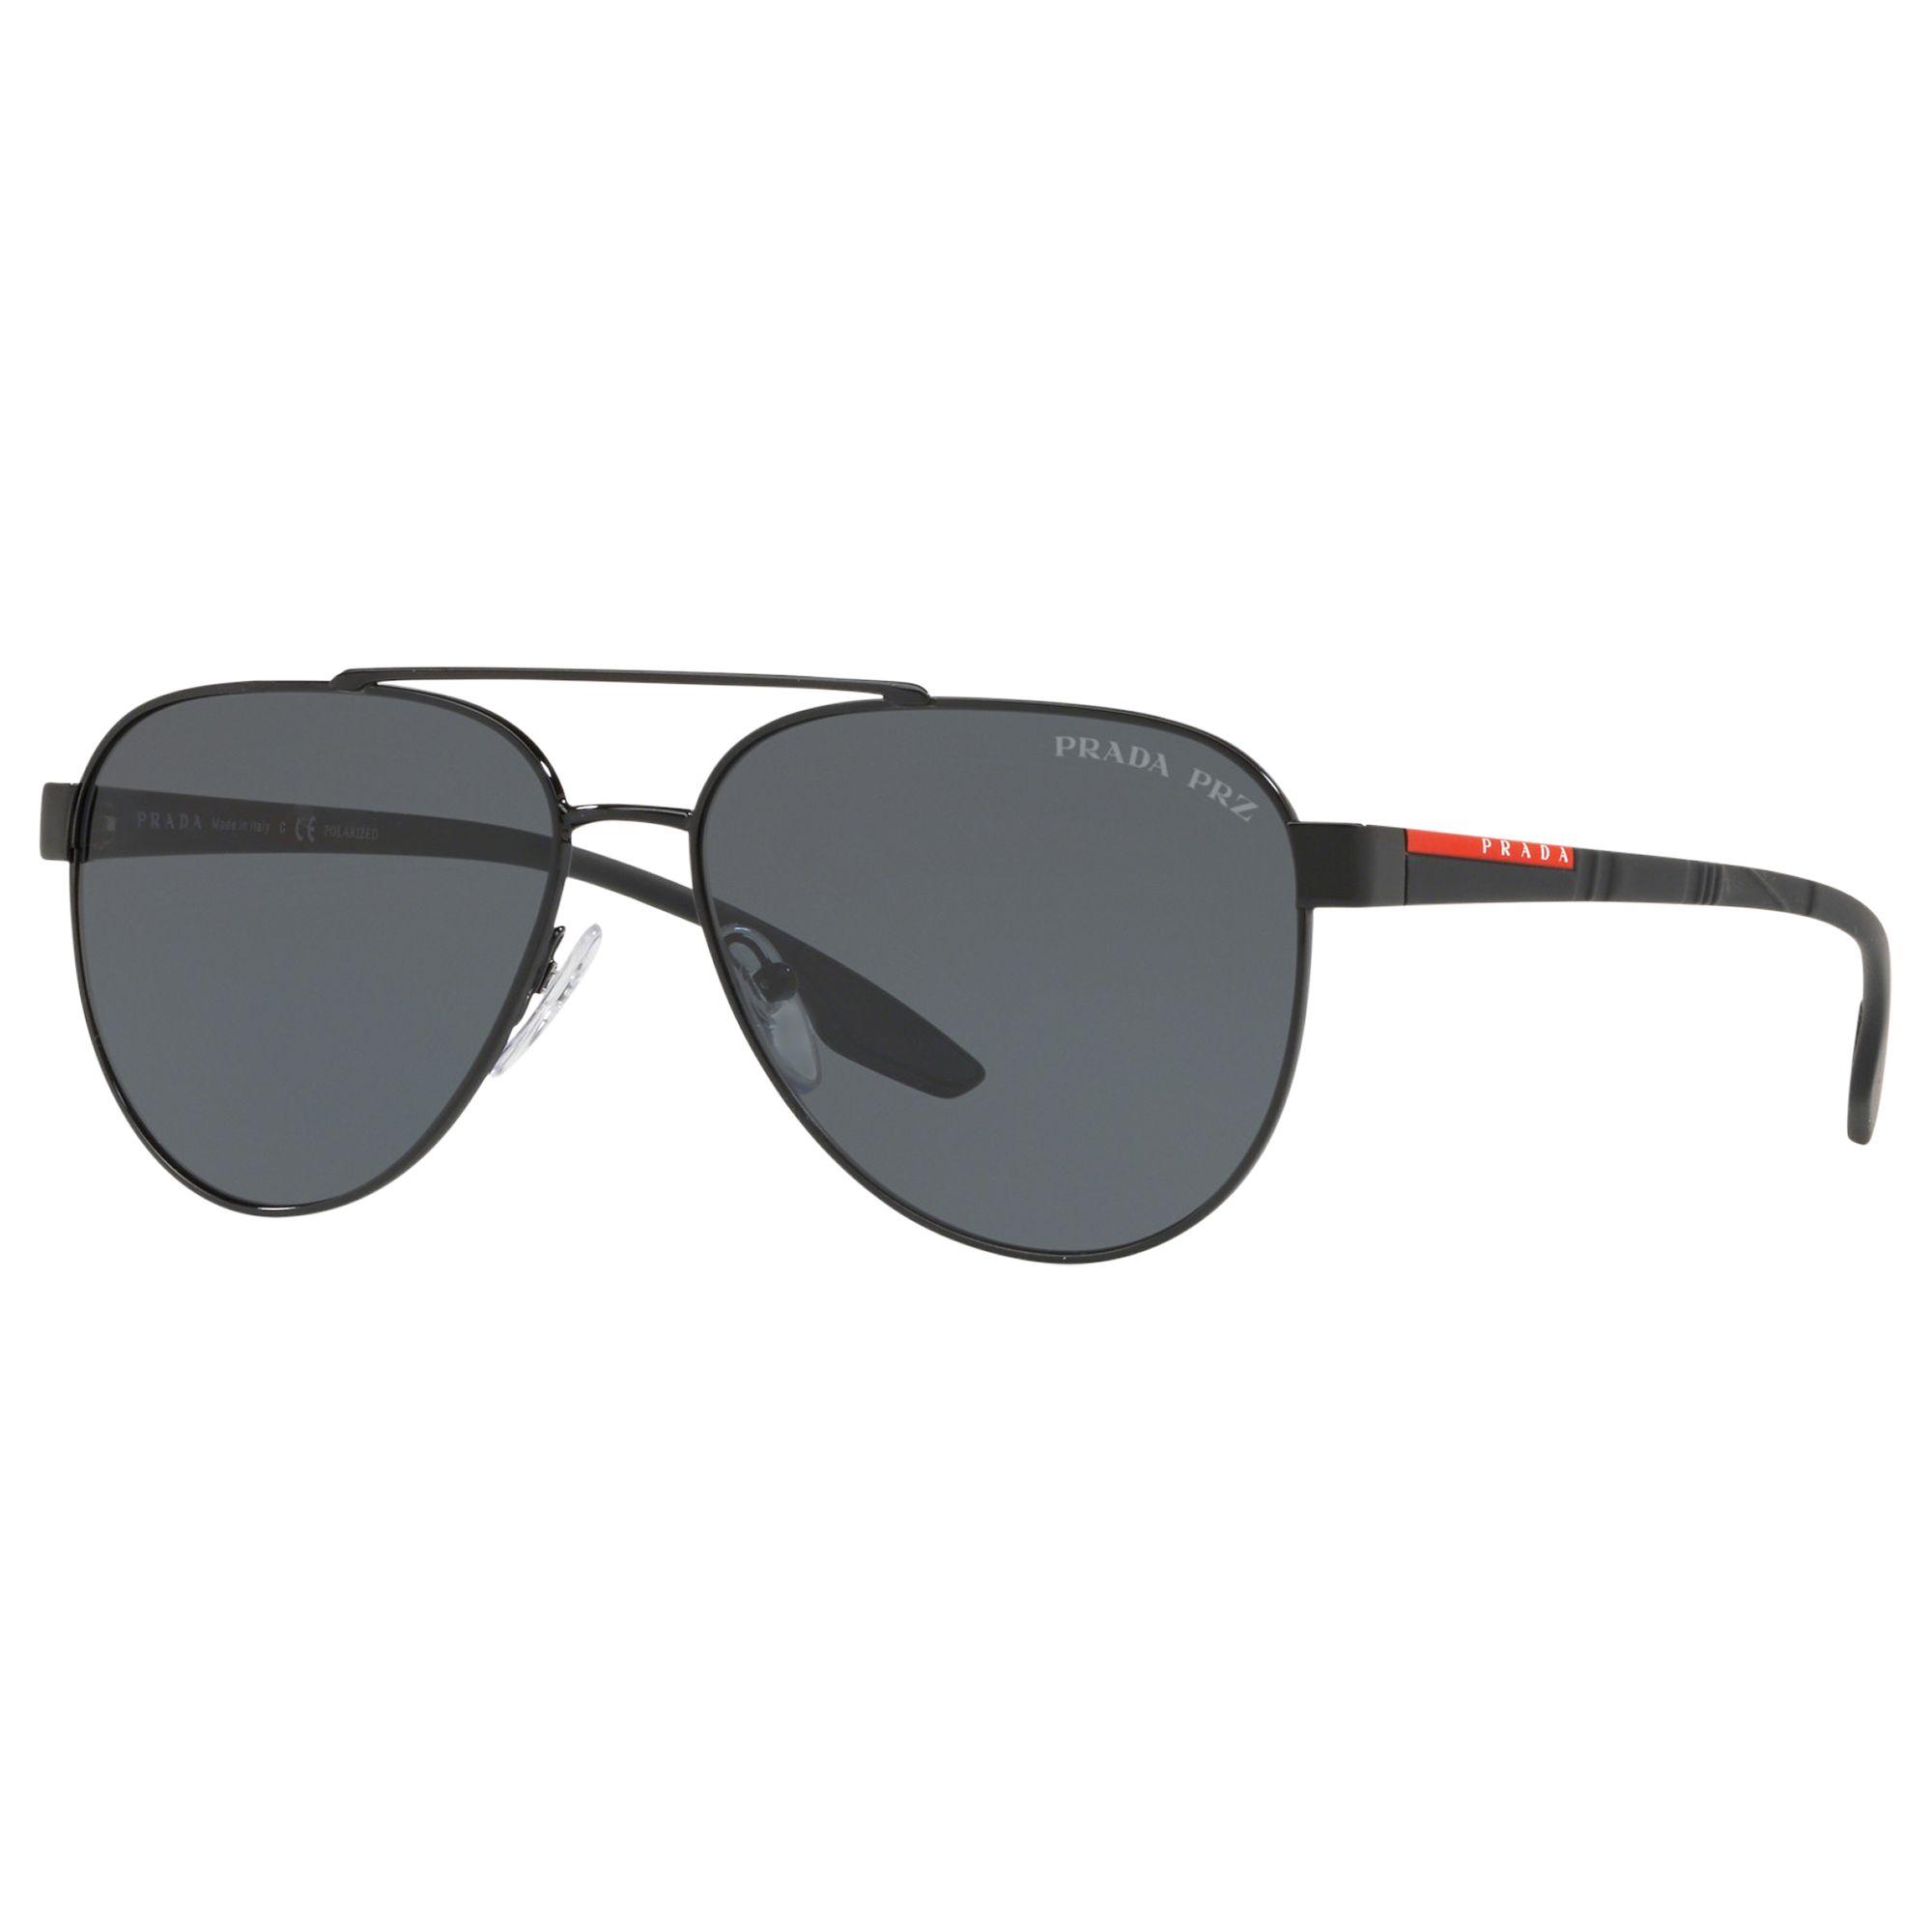 c52ae54a67a1 Prada Linea Rossa PS 54TS Men's Polarised Aviator Sunglasses at John Lewis  & Partners